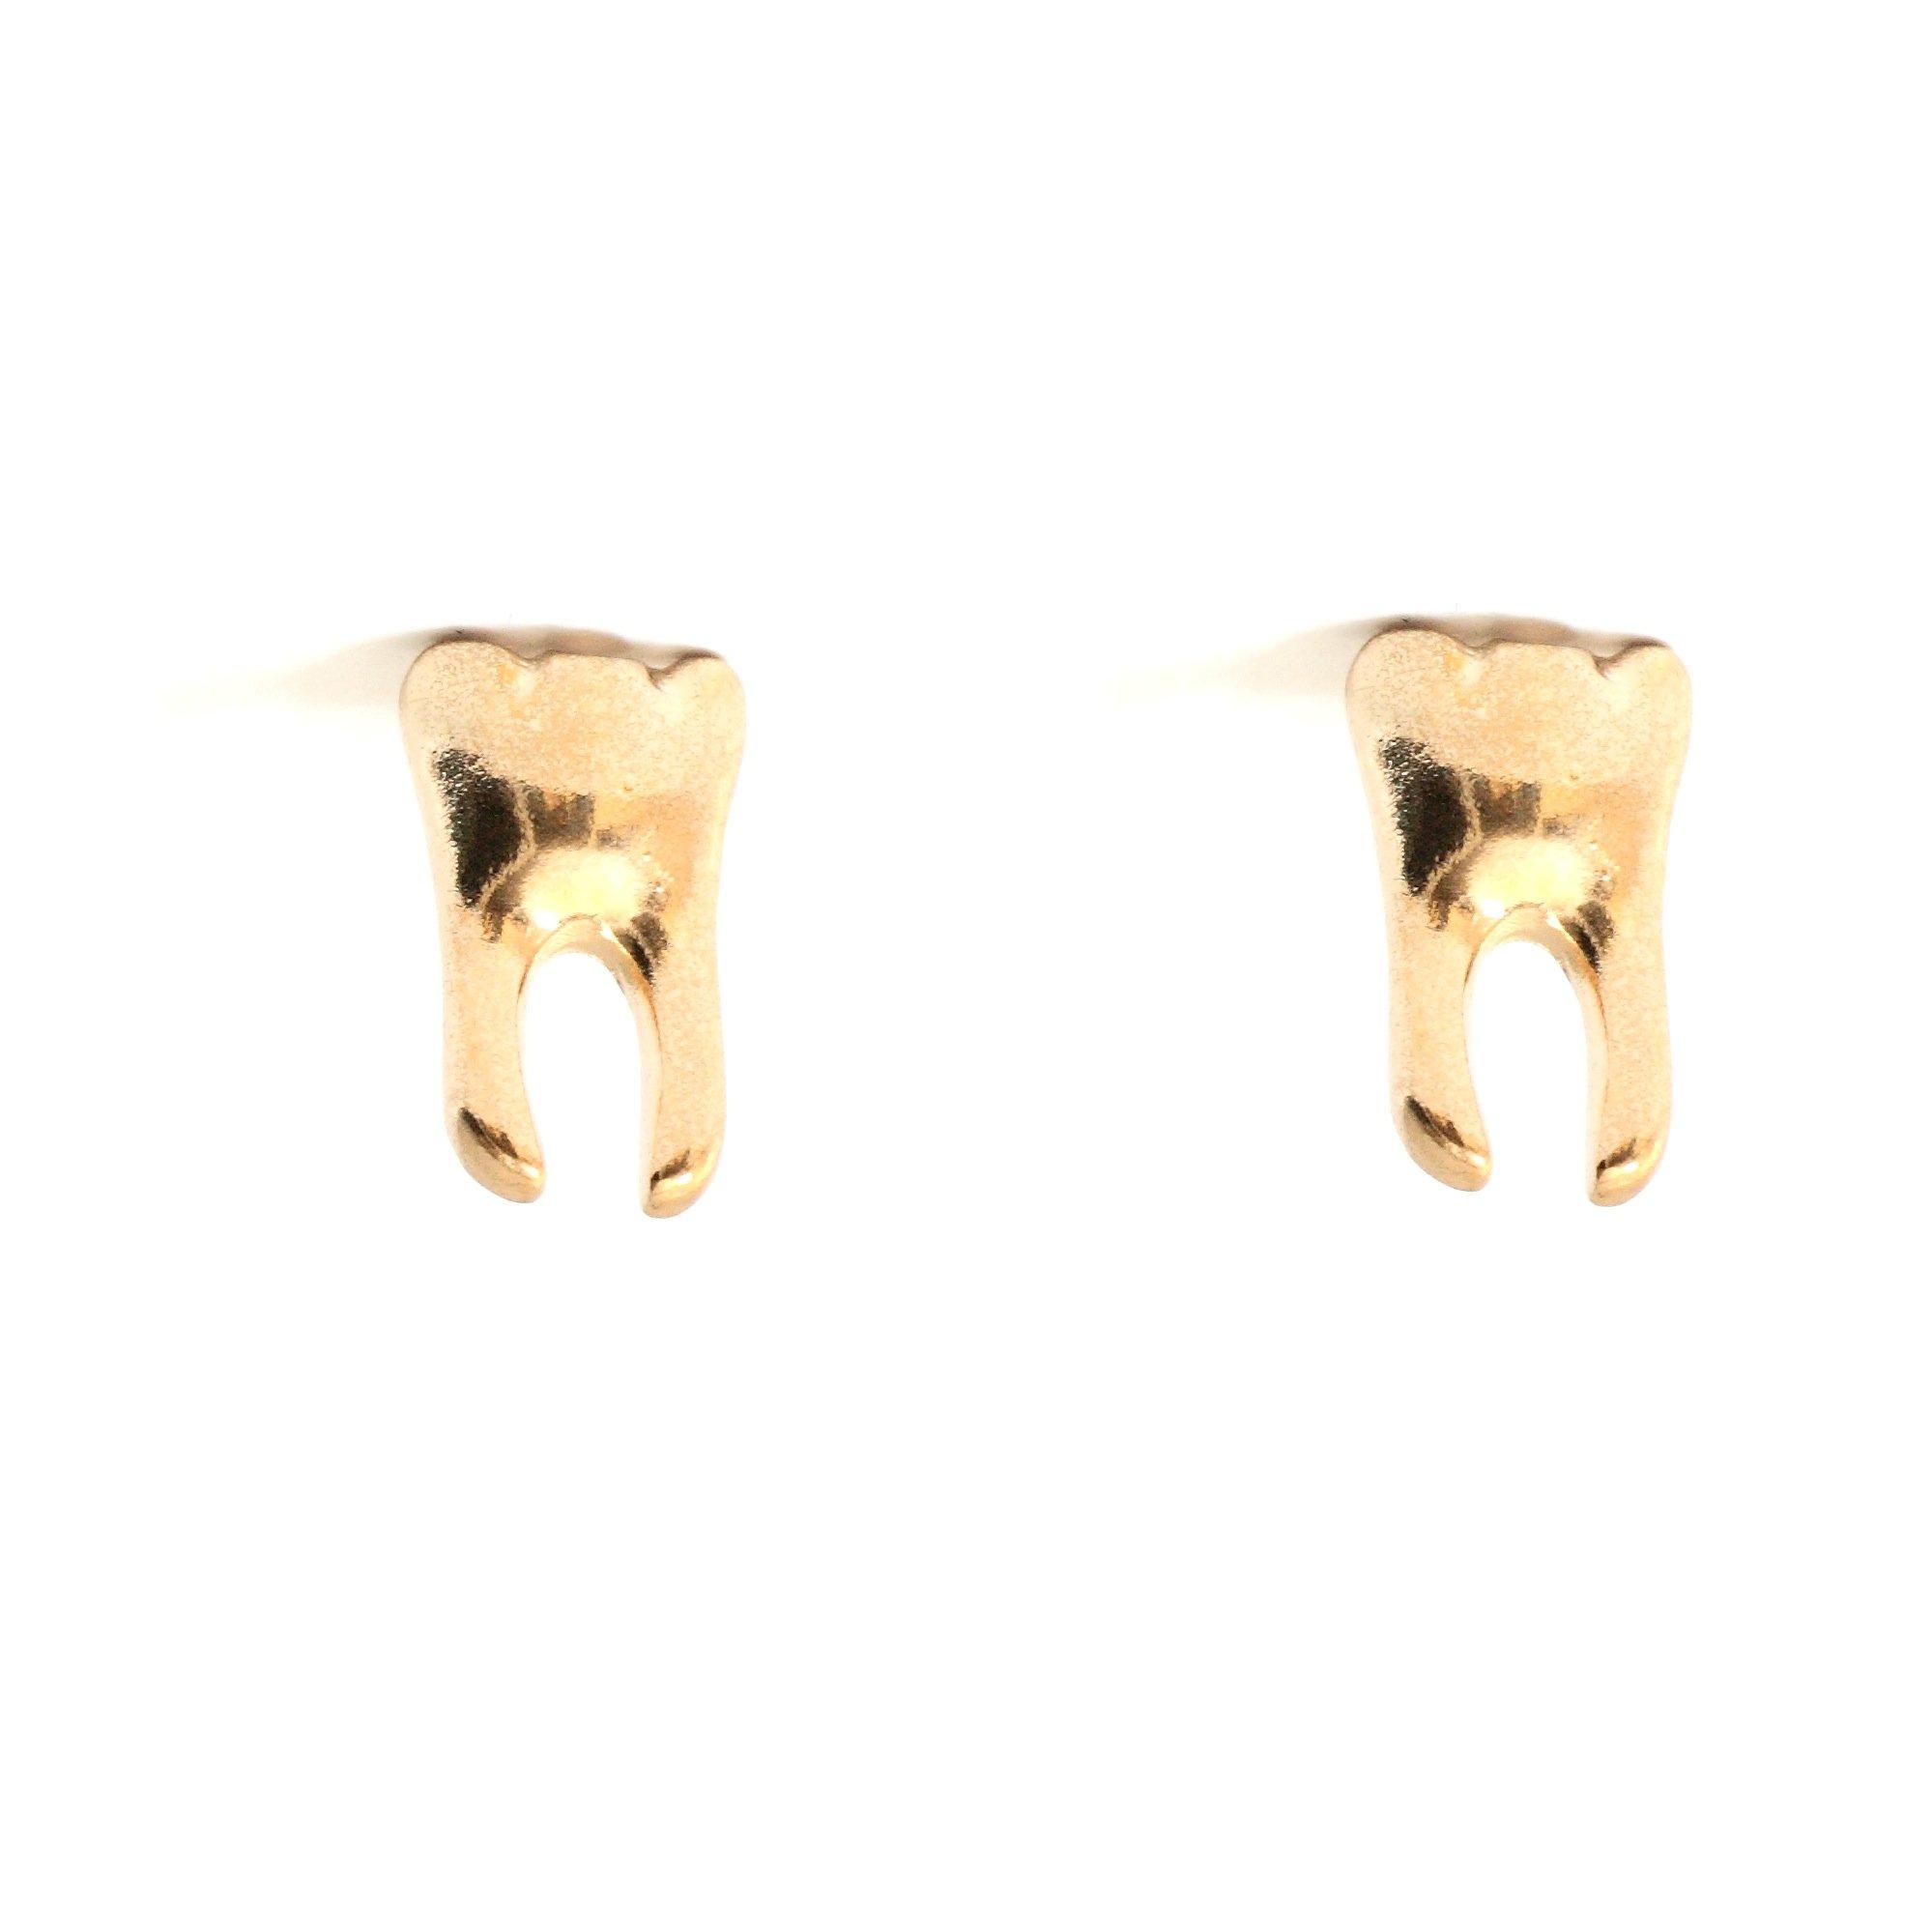 Magic Metal Molar Tooth Stud Earrings Gold Tone EA18 Tribal Cannibal Dental Grill Posts Fashion Jewelry